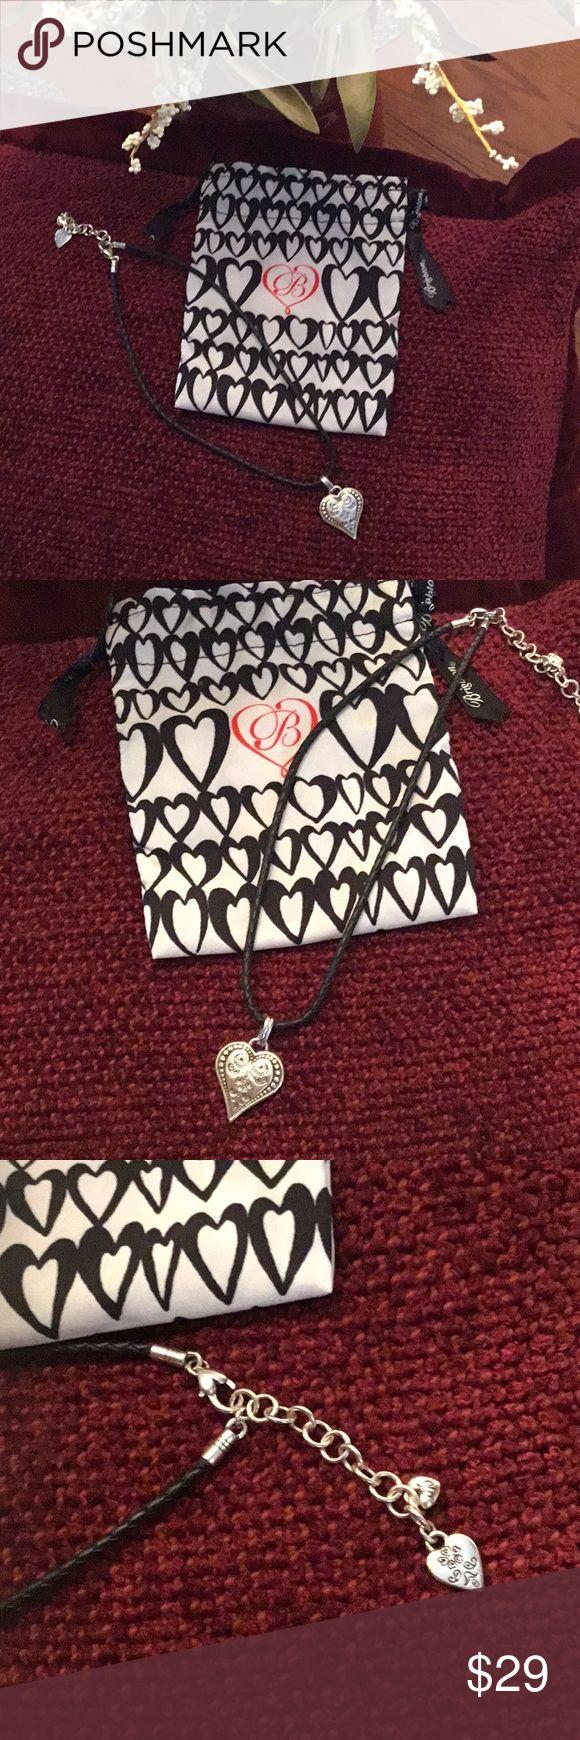 💕Brighton Classic Heart Pendant w/Leather Cord Beautiful Brighton Heart Pendant on Black Leather Cord Necklace. NWT  Comes with Brighton Gift Bag 😘 Brighton Jewelry Necklaces